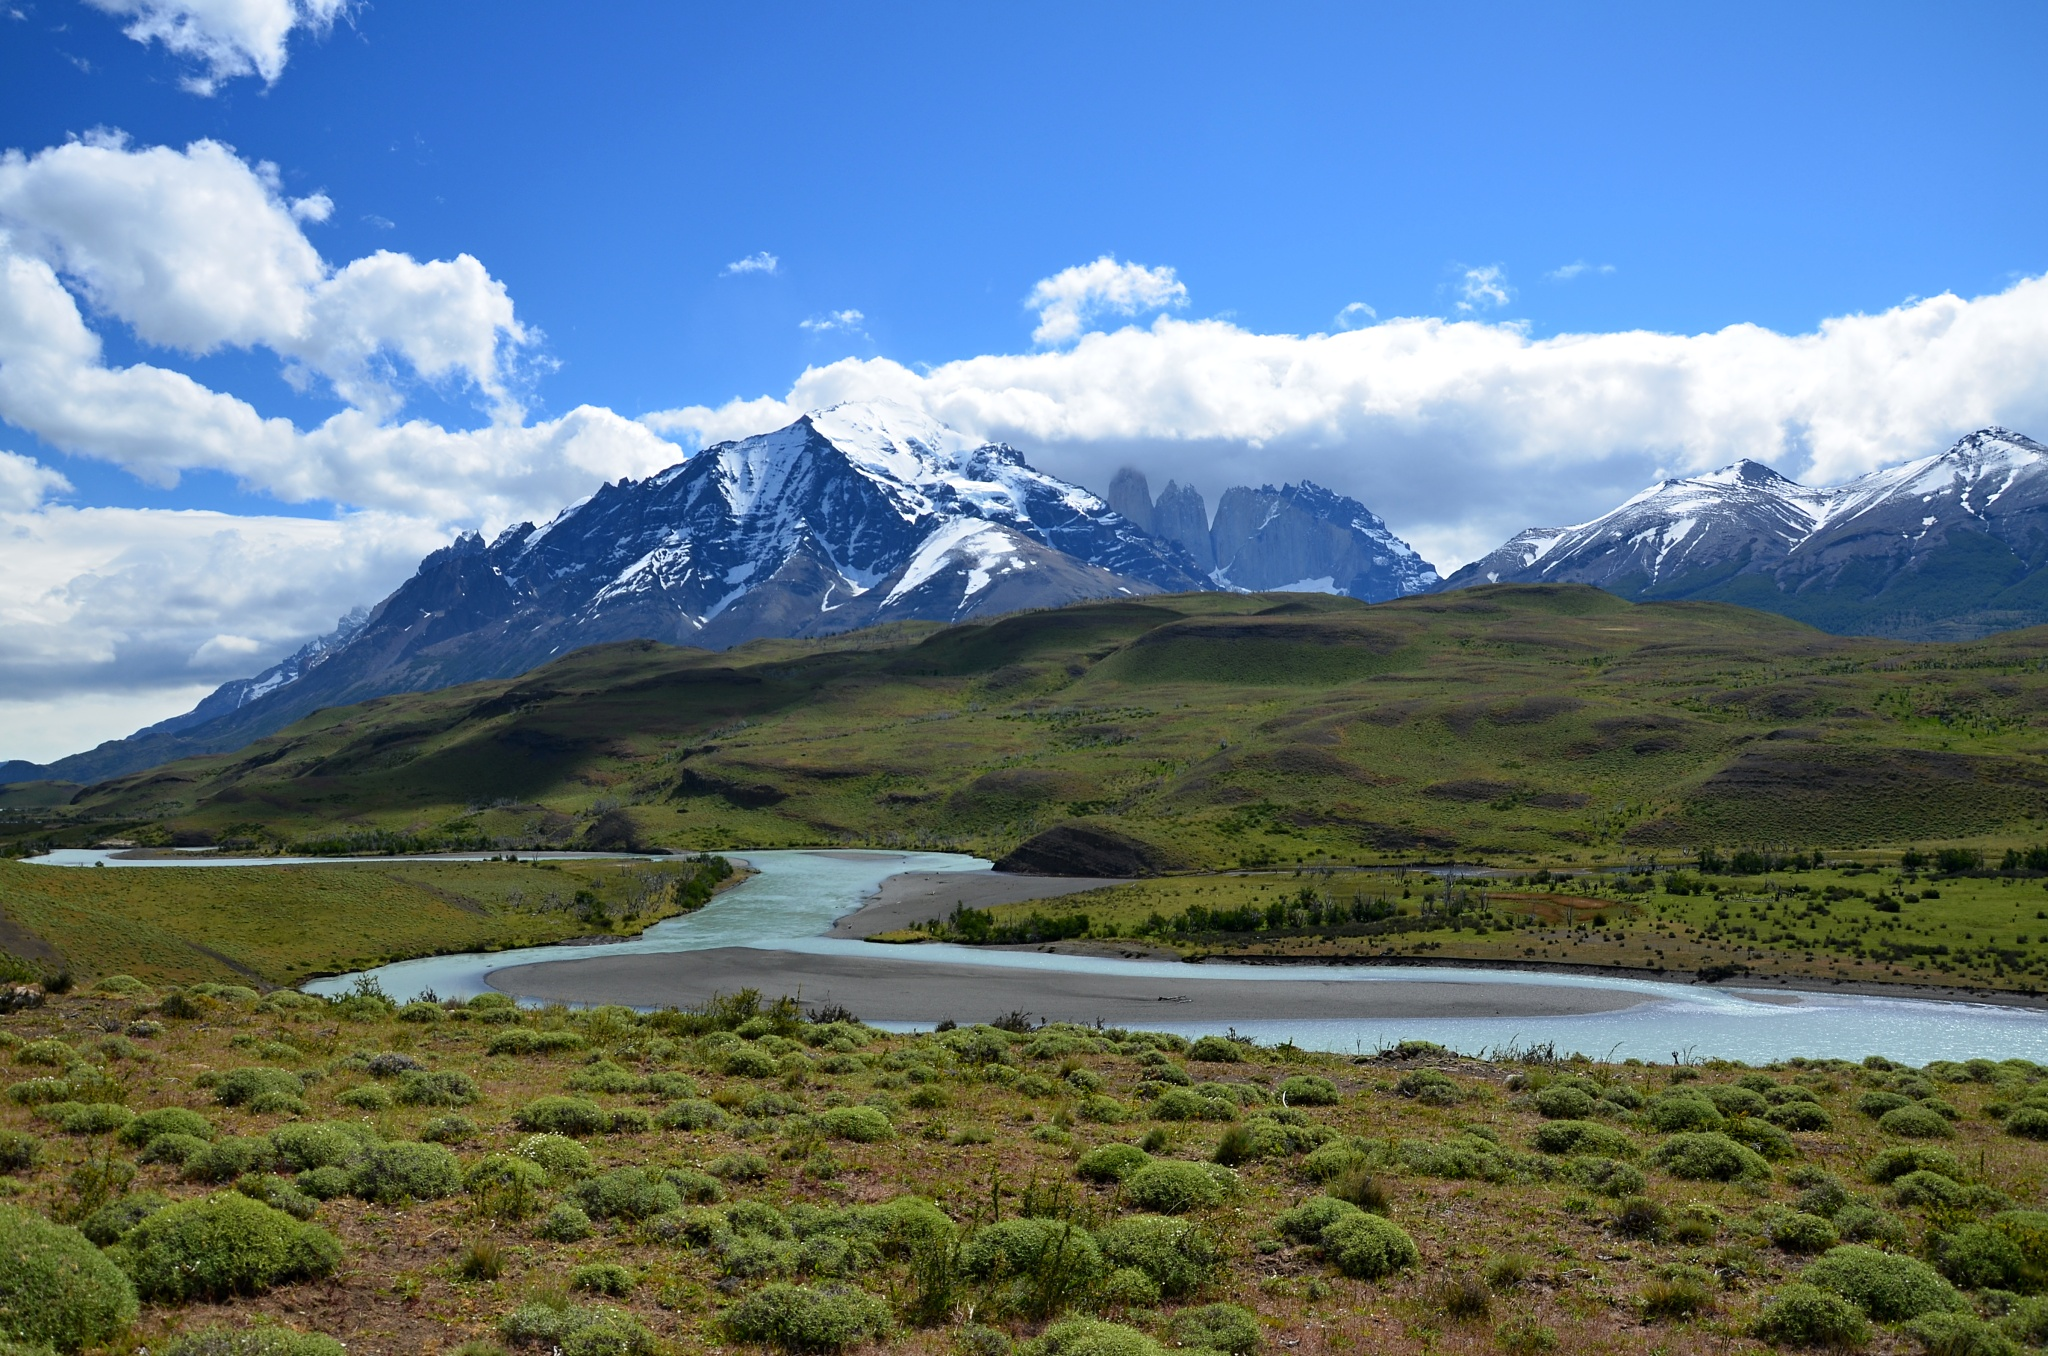 Cerro Paine v pozadí, Río Paine v popředí